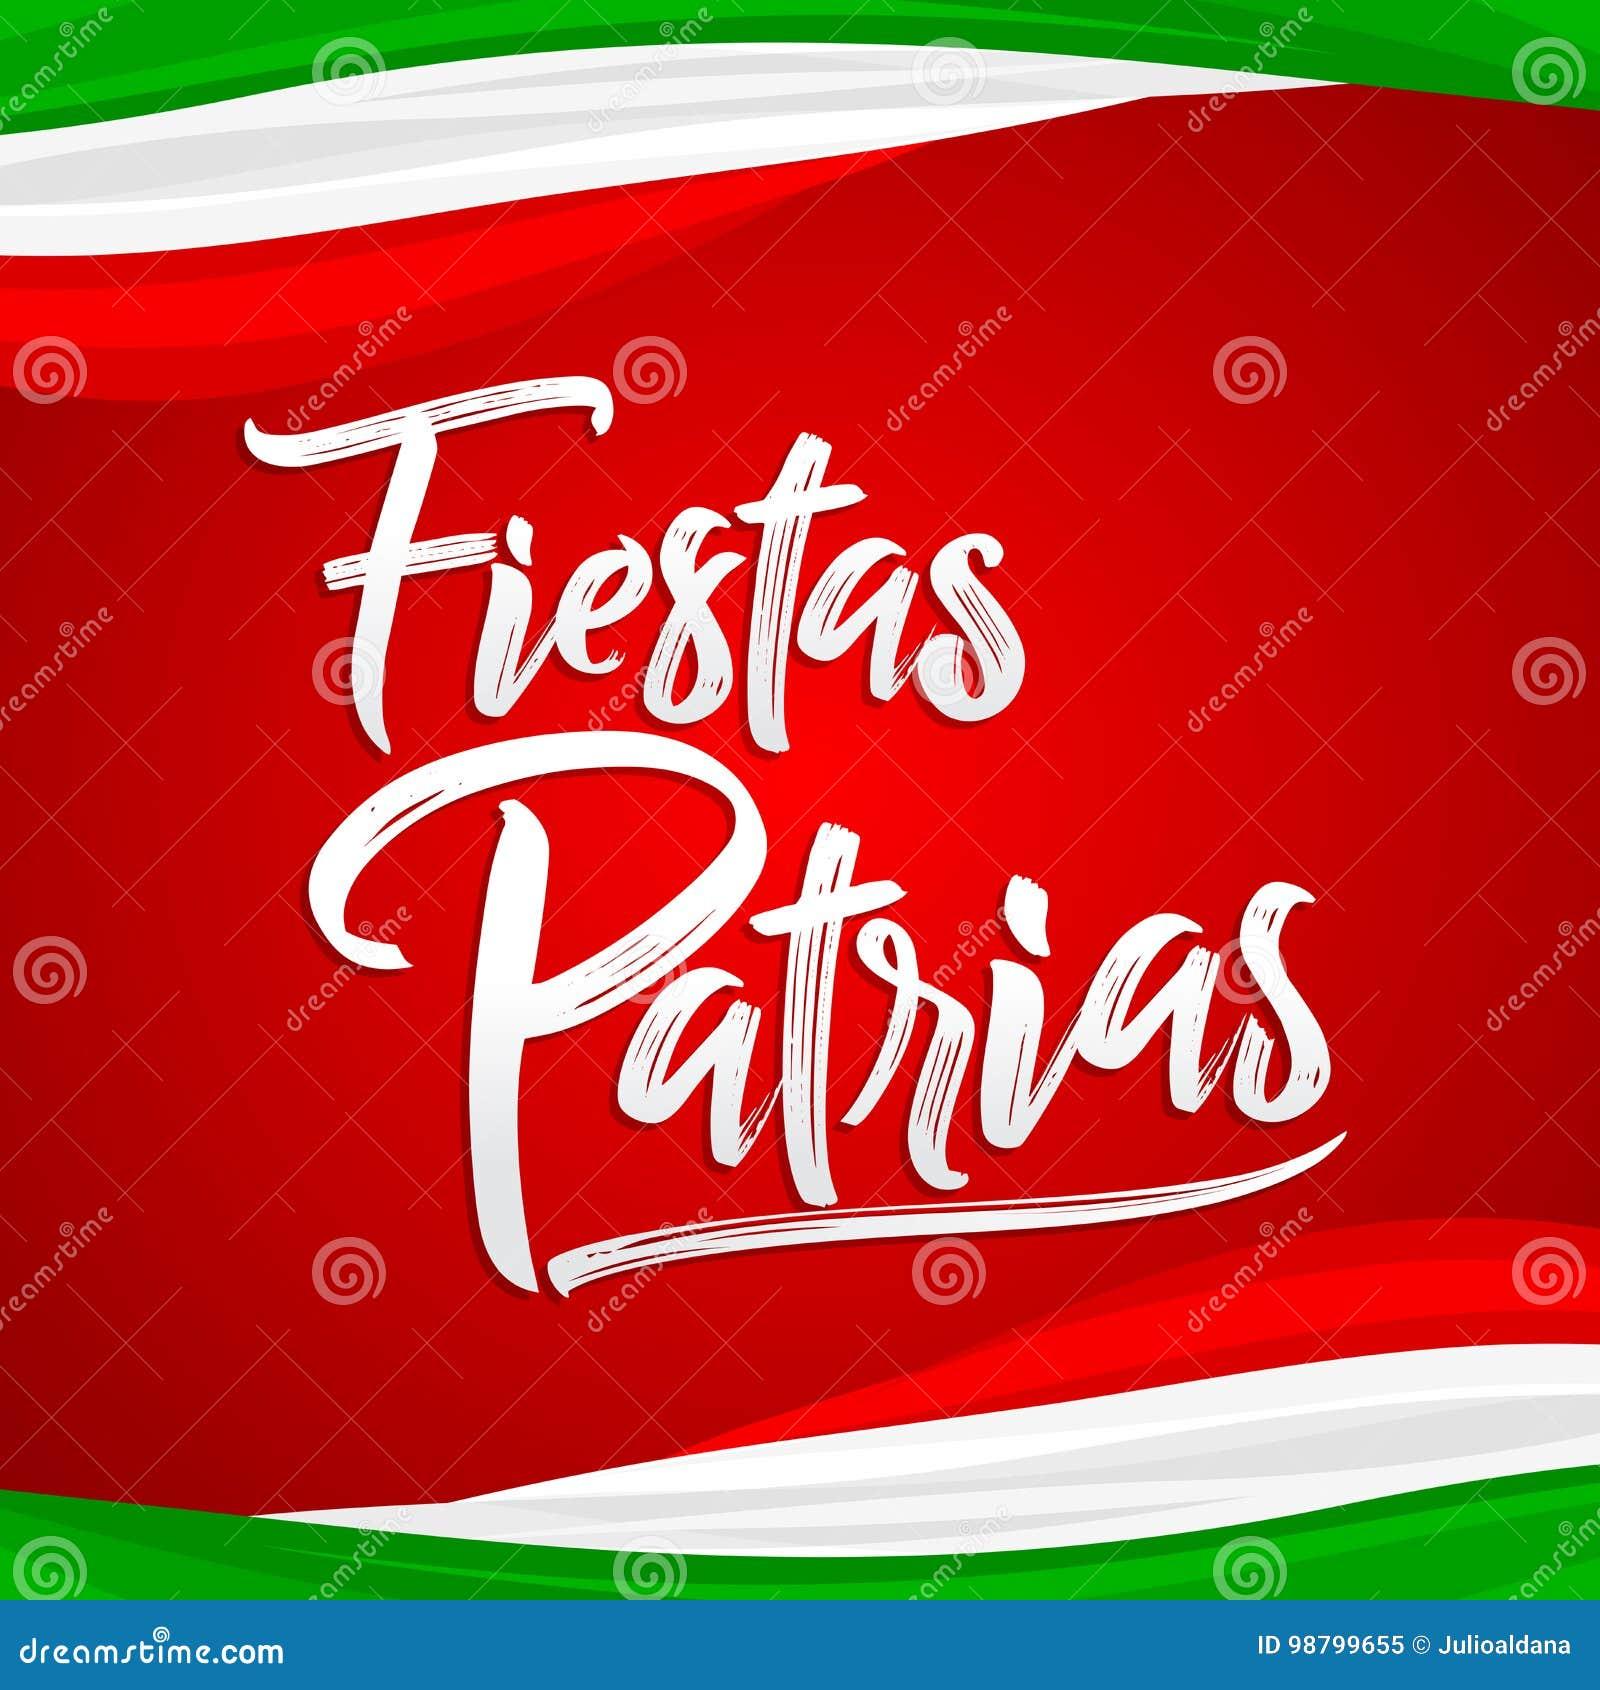 Fiestas Patrias National Holidays Spanish Text Mexican